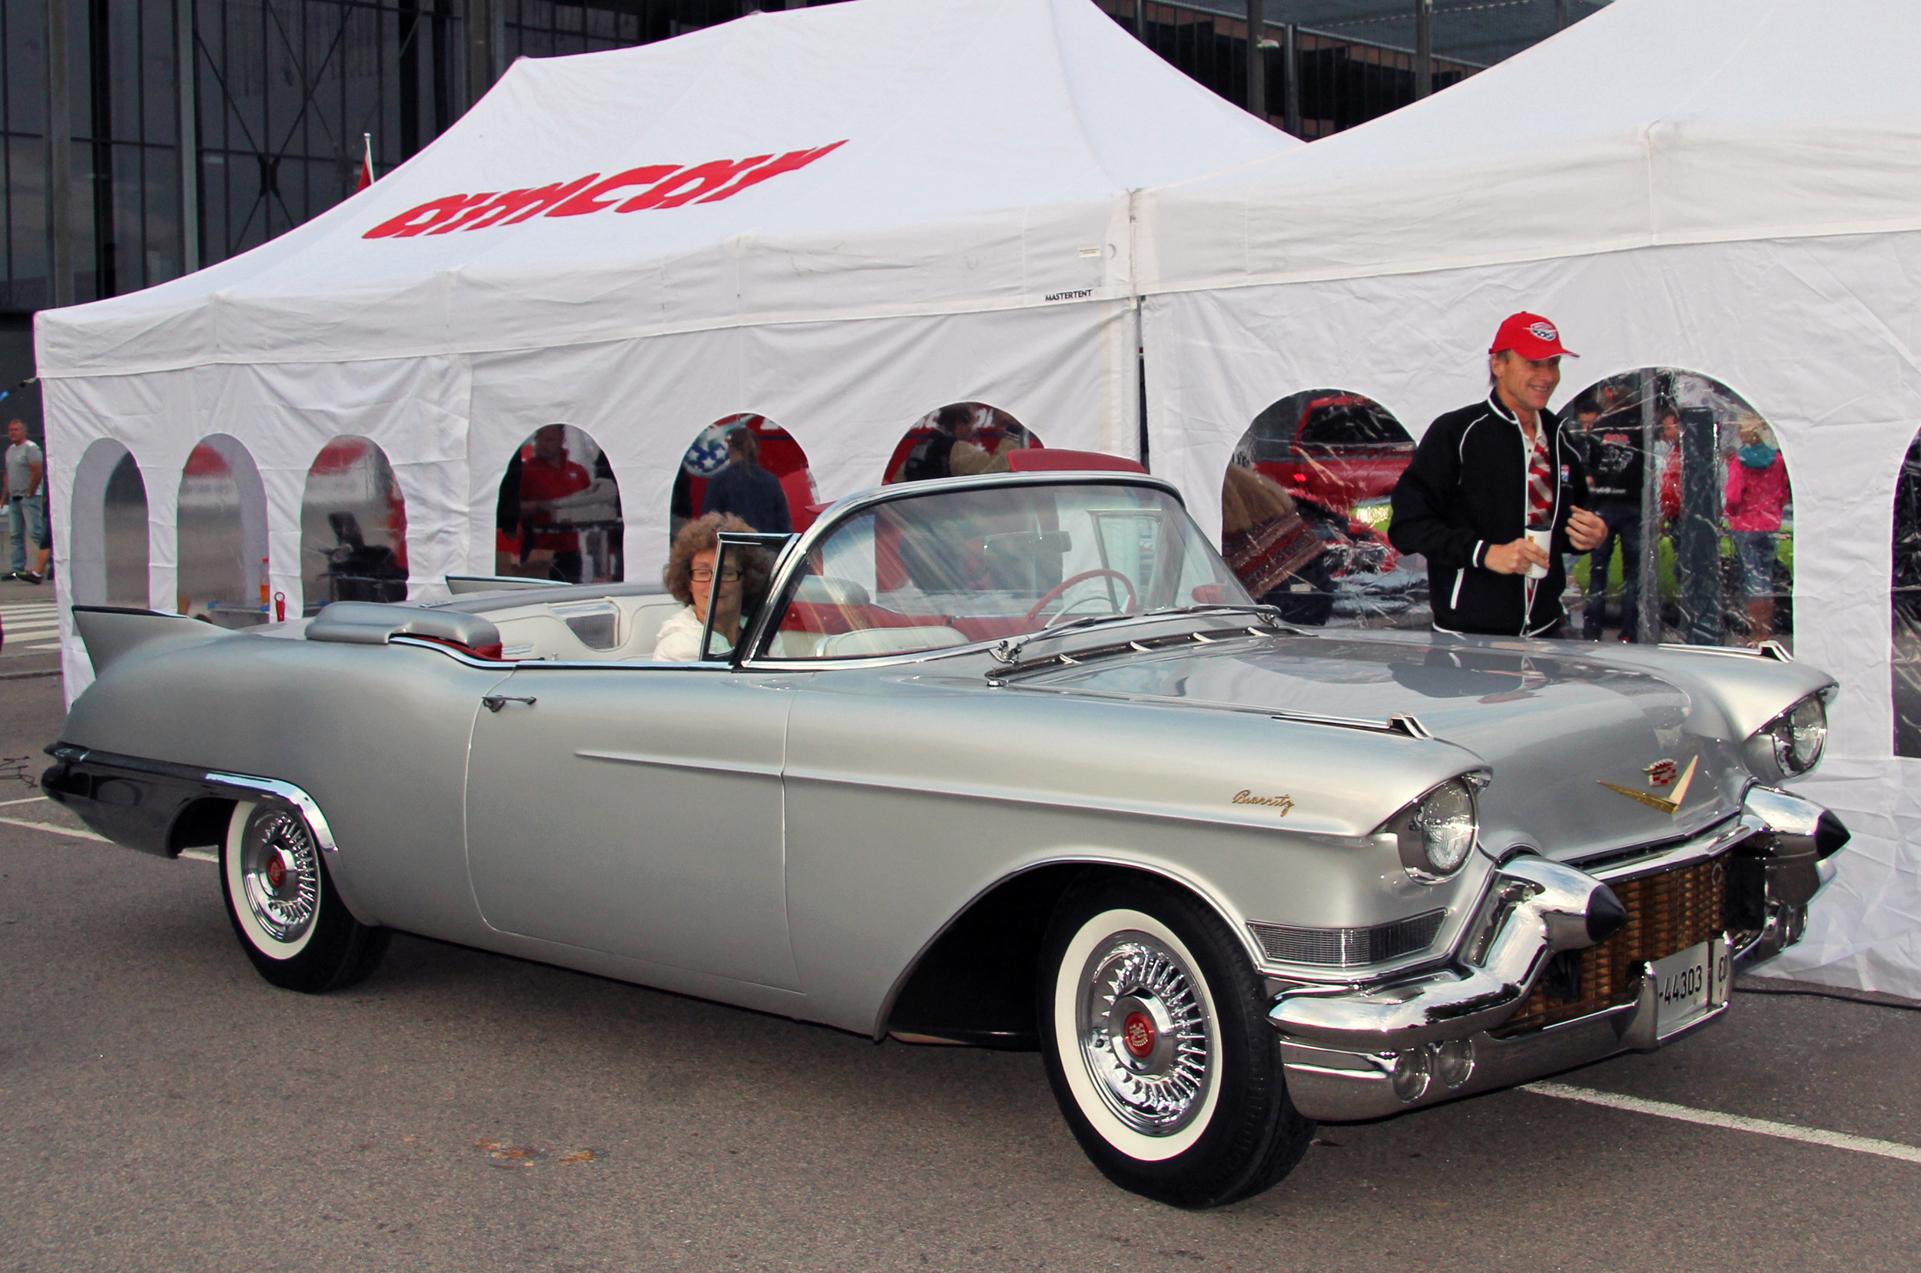 016-1957 Cadillac Eldorado Biarritz 01. Eier- medl